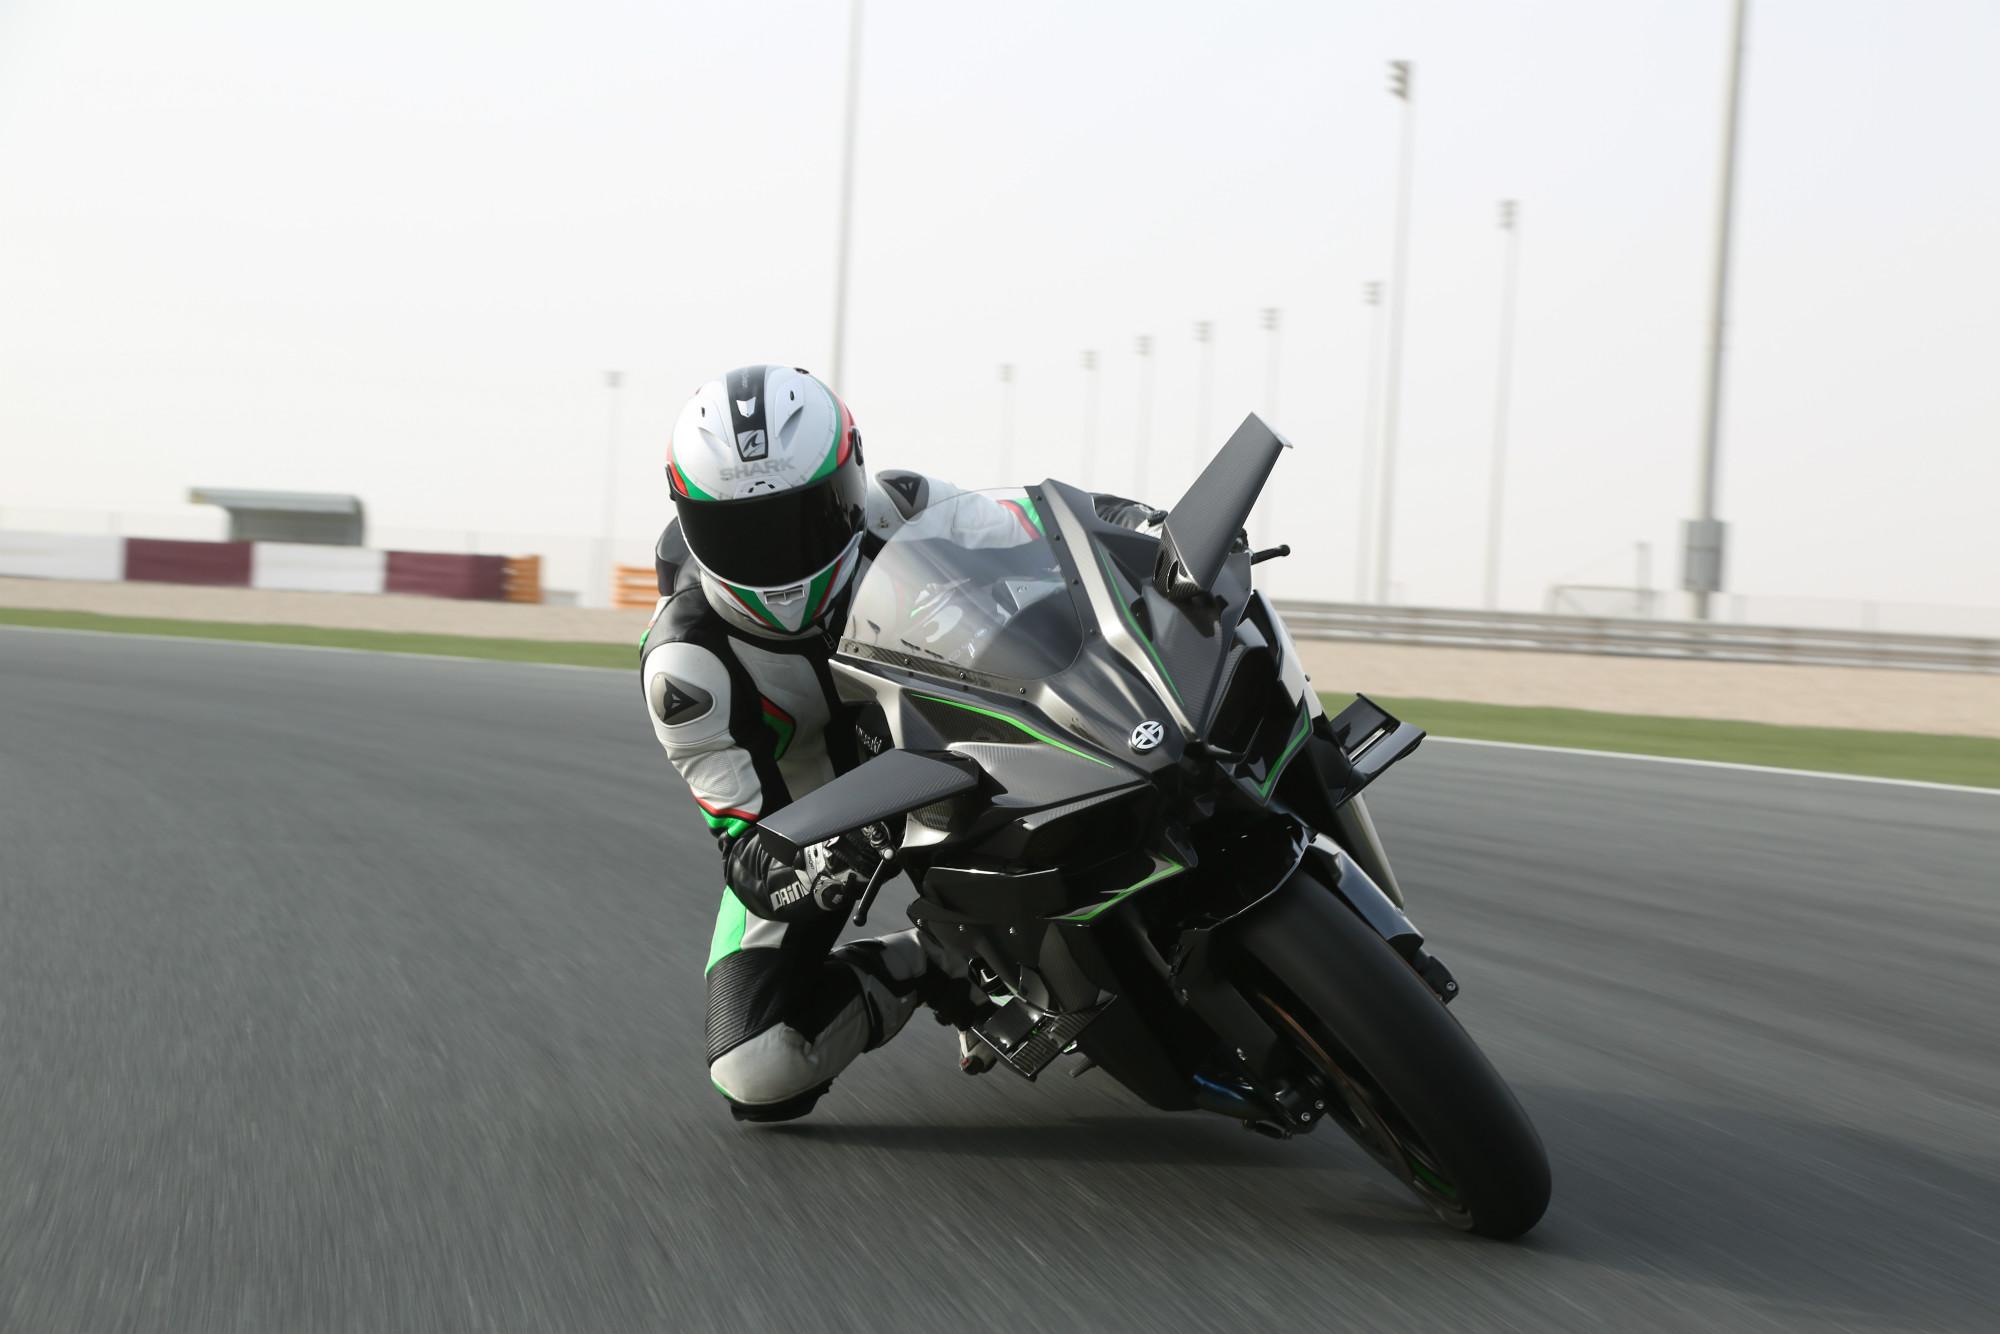 Kawasaki Ninja H2r >> First ride: Kawasaki Ninja H2 and H2R re... | Visordown